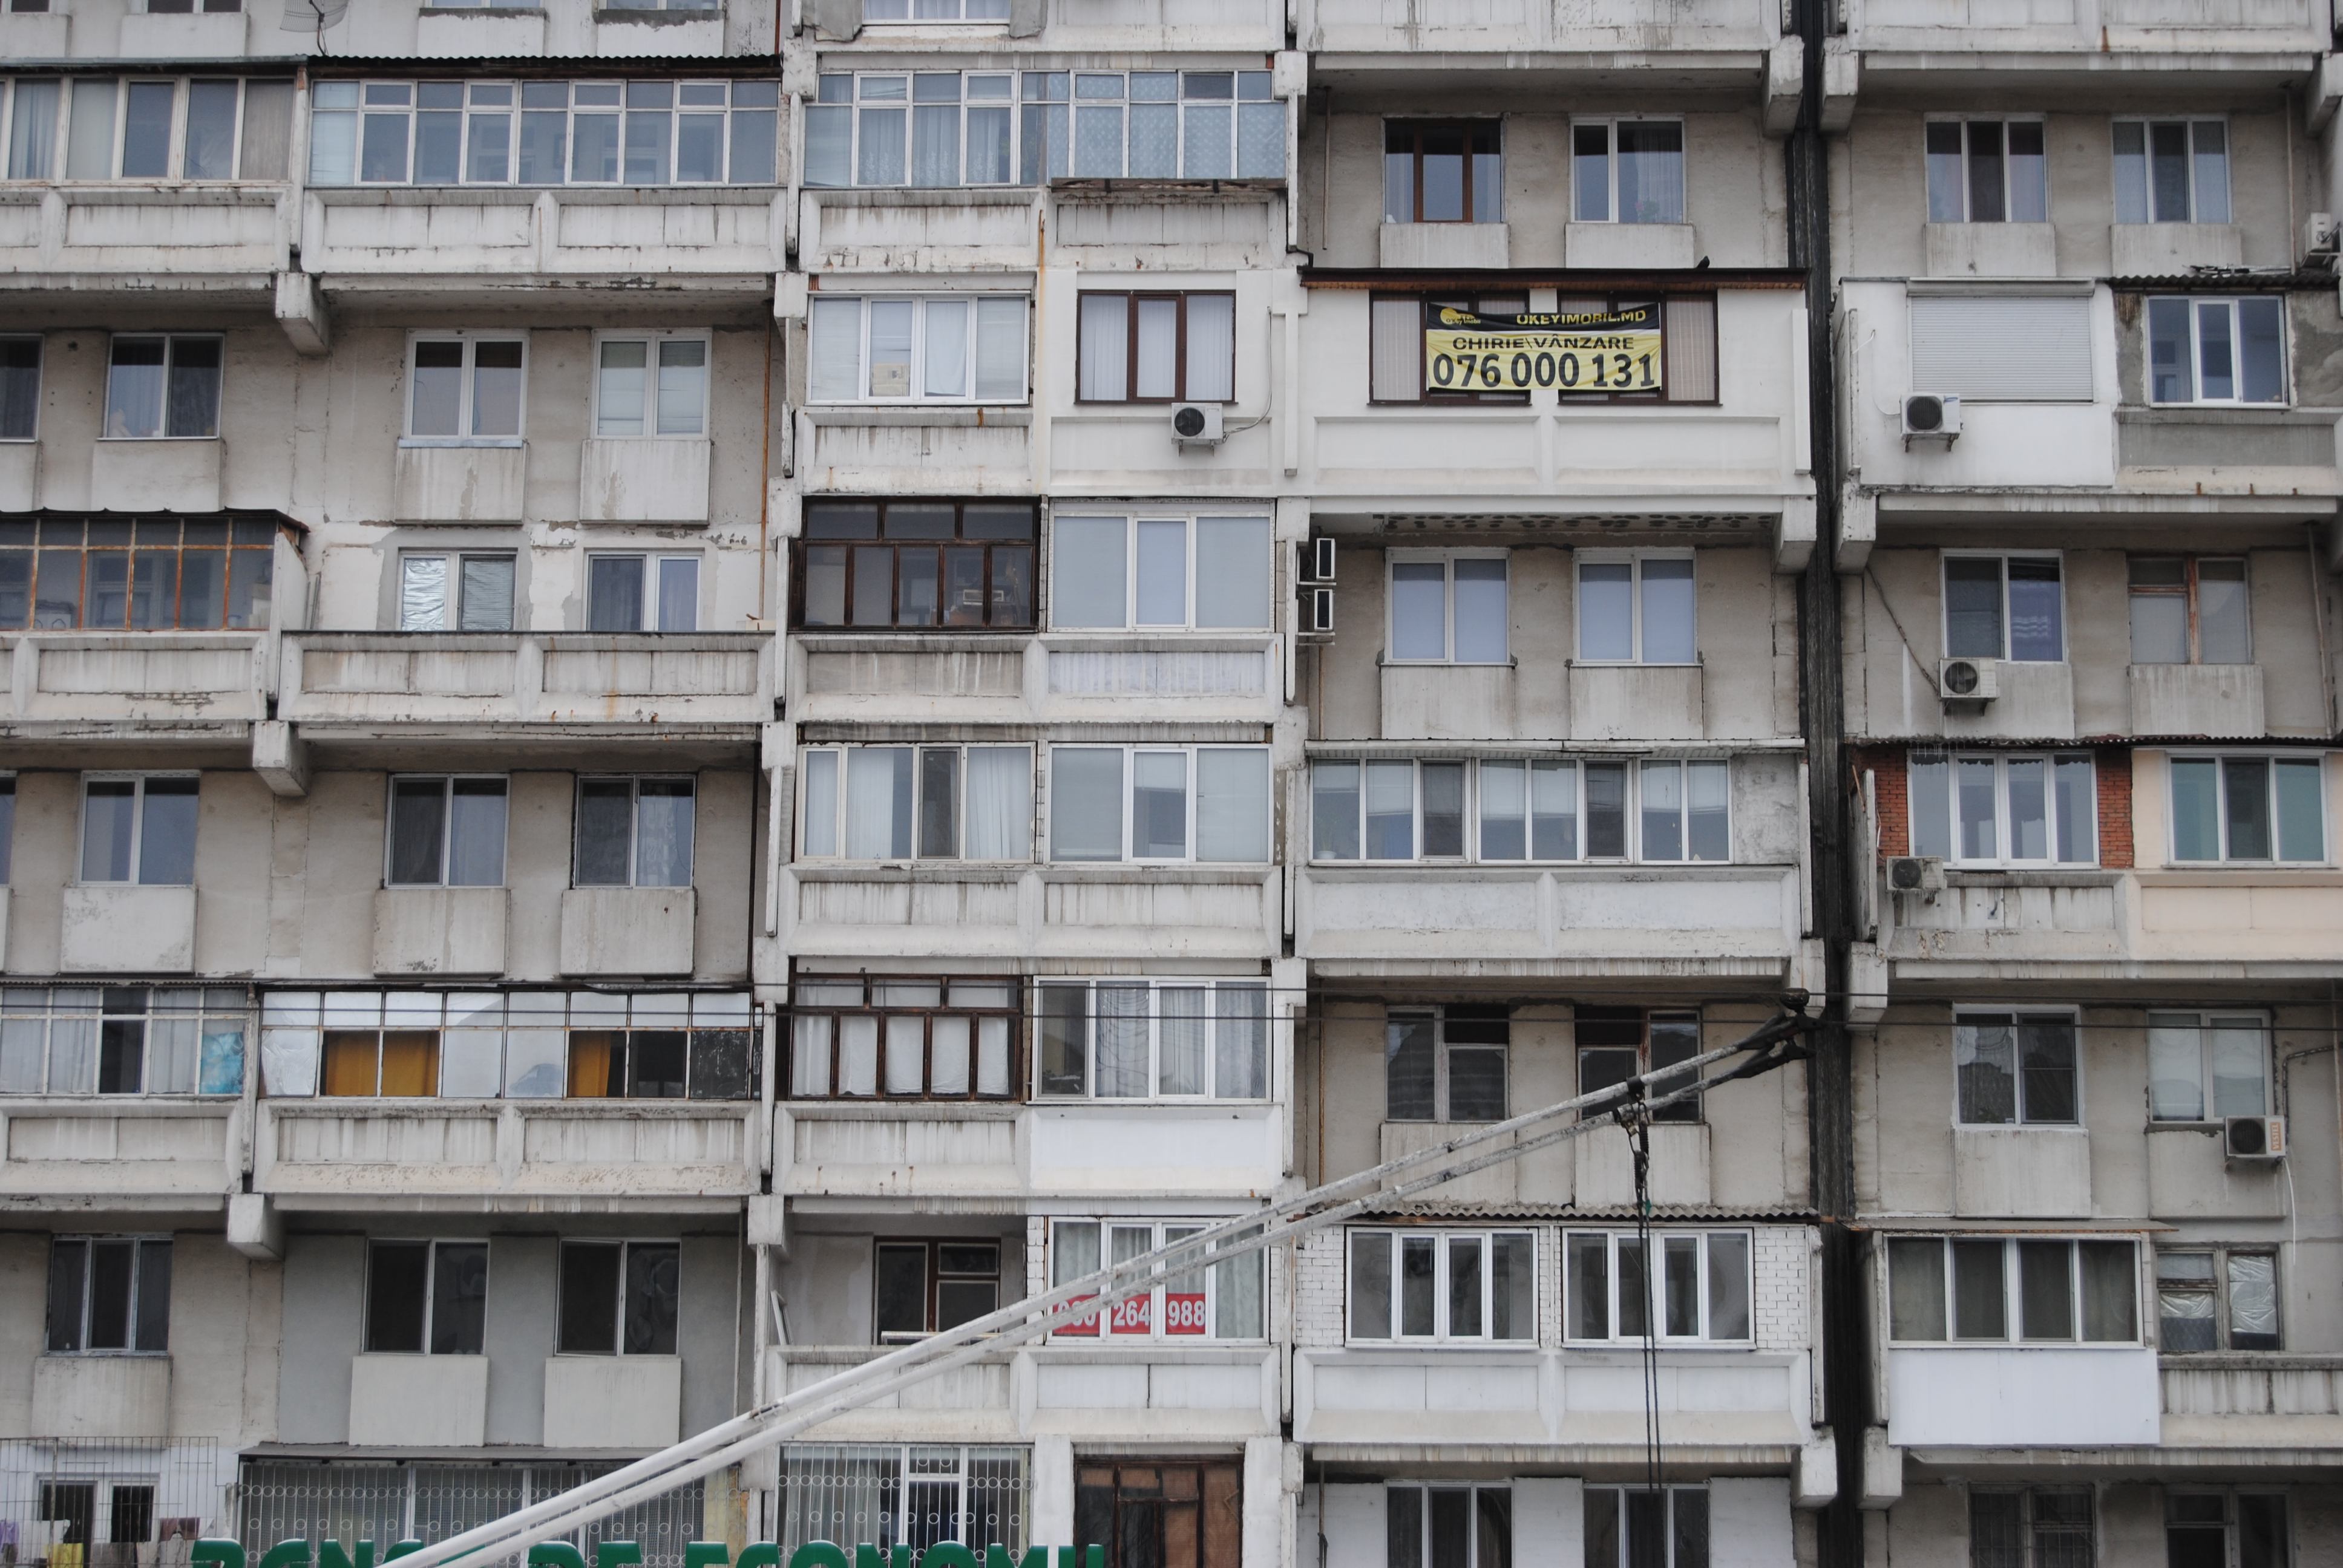 Bloques de pisos en Chisinau